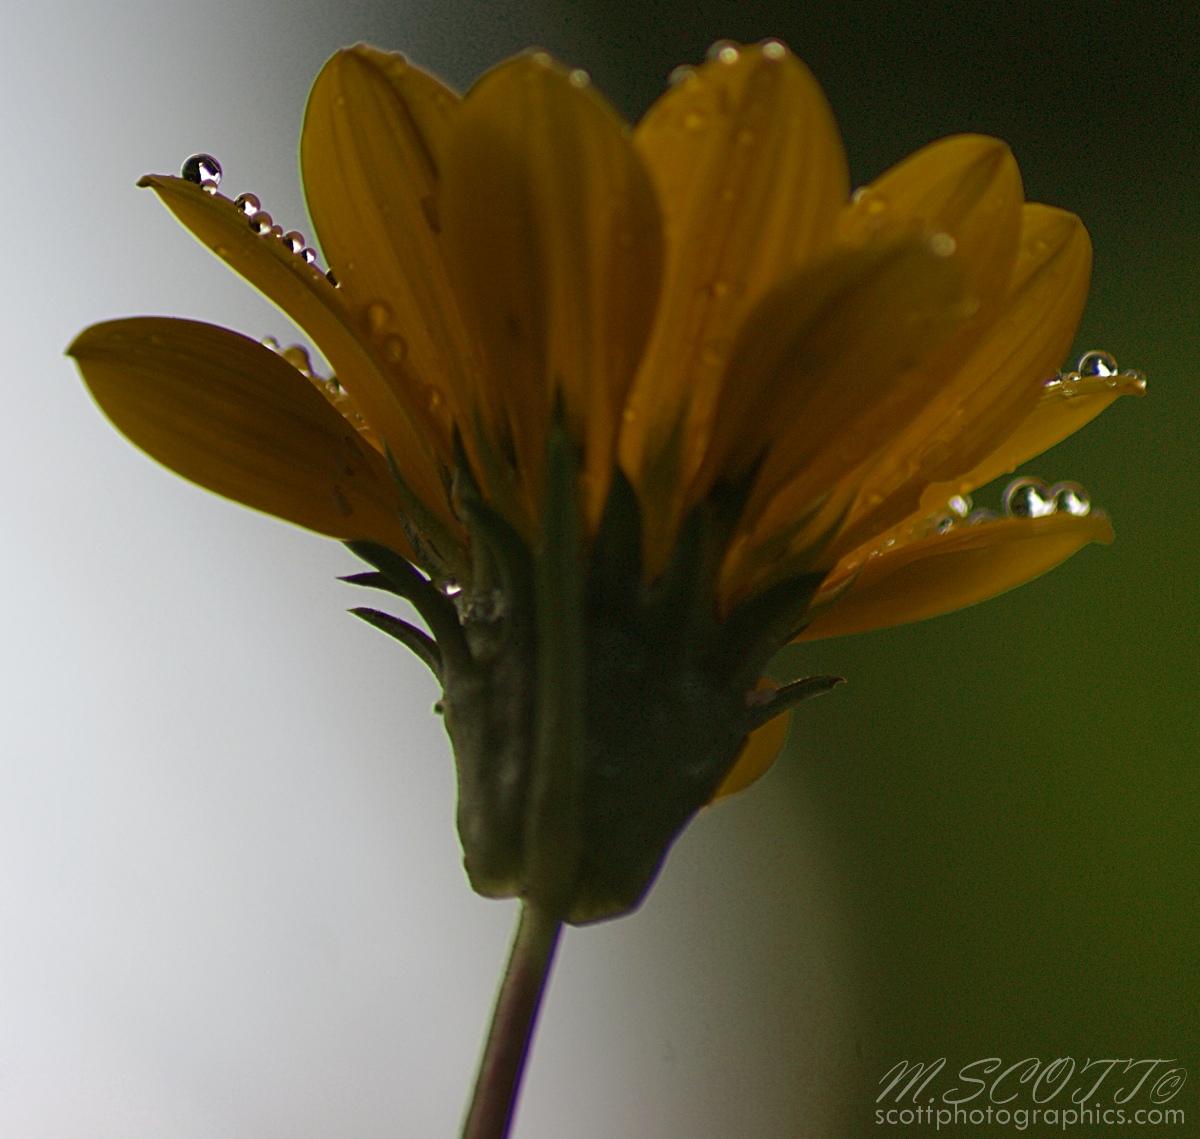 yellow-flower-water-droplets-1.jpg